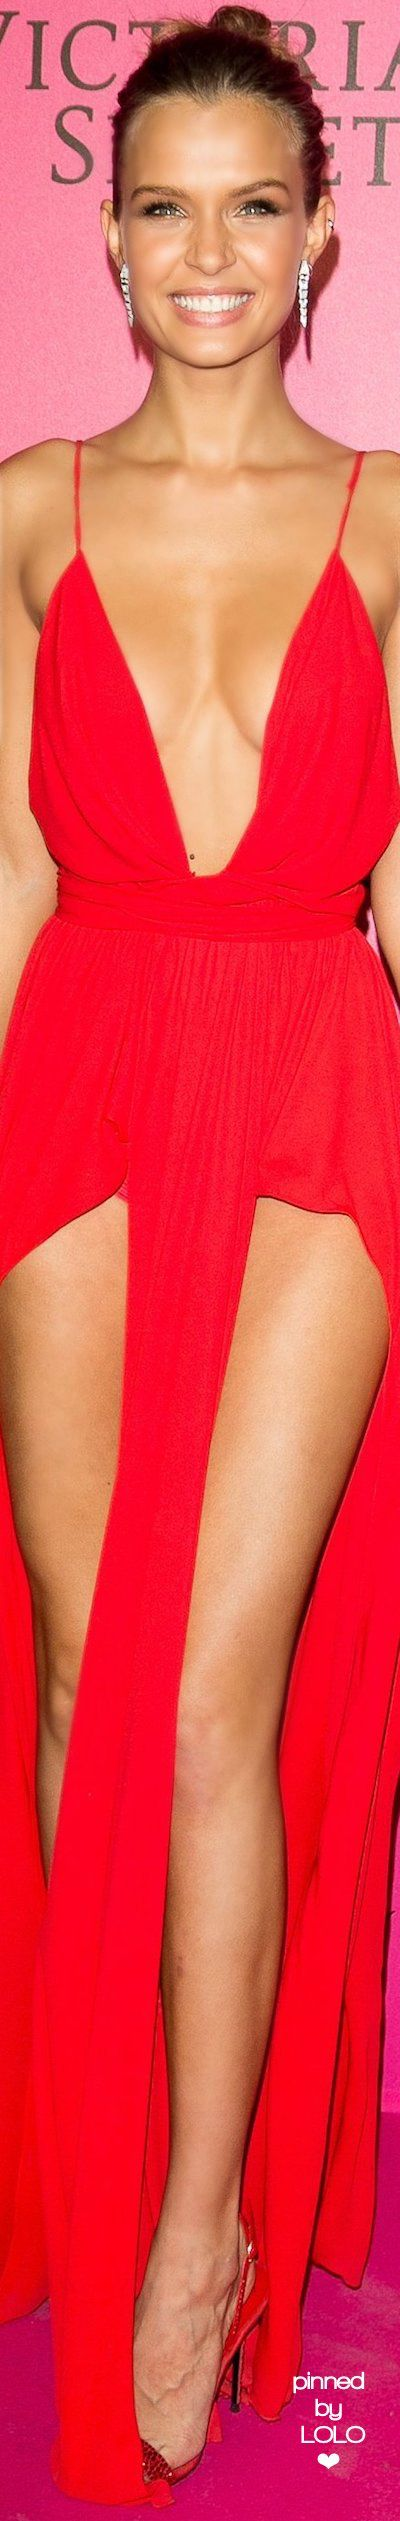 Josephine Skriver 2016 Victoria Secret Fashion Show After Party | LOLO❤︎